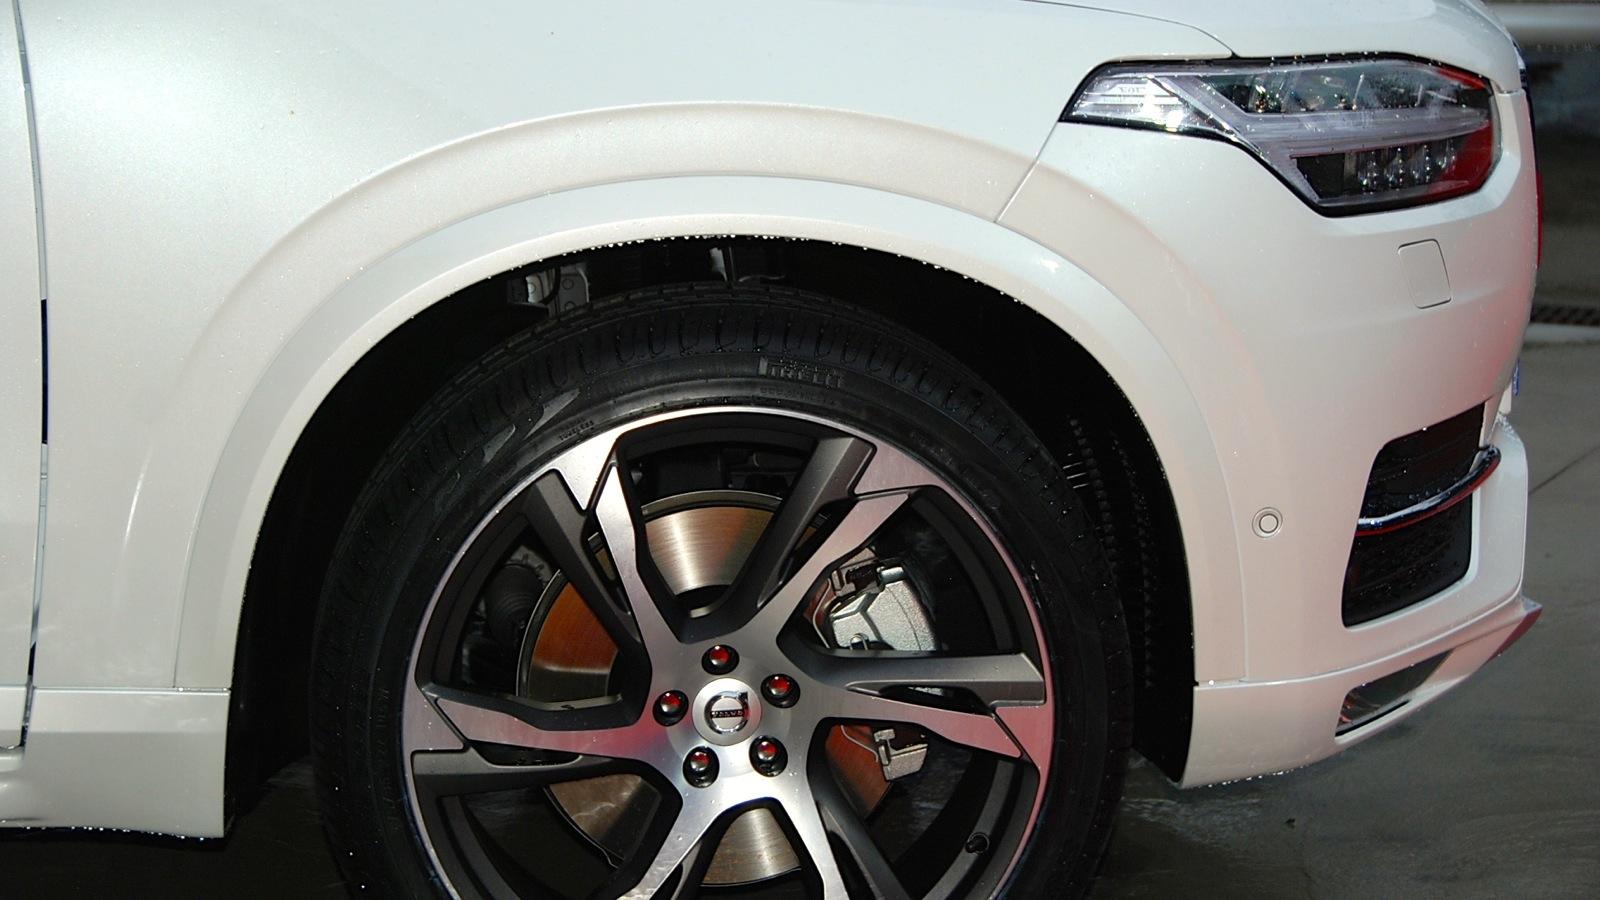 Volvo Xc90 R Design >> 2015 Volvo XC90 details revealed - photos | CarAdvice